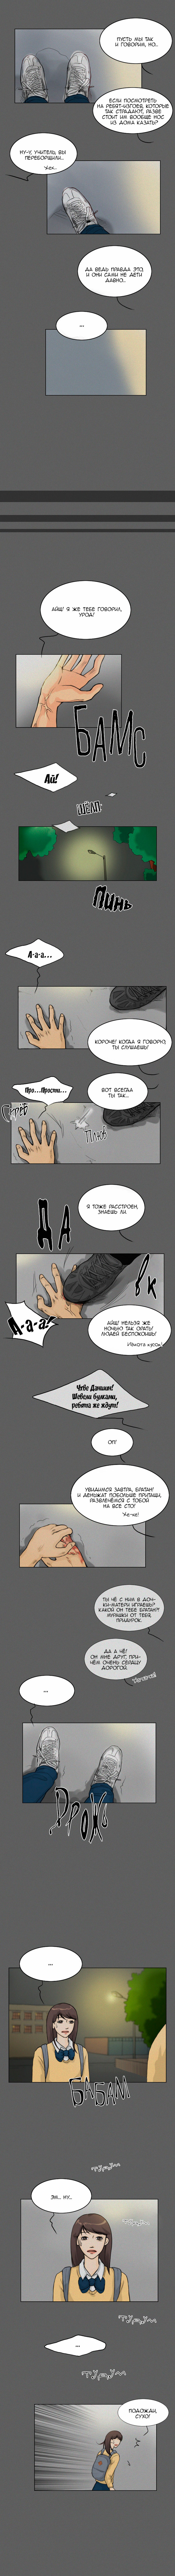 https://r1.ninemanga.com/comics/pic2/8/31048/426343/1535044285978.jpg Page 4